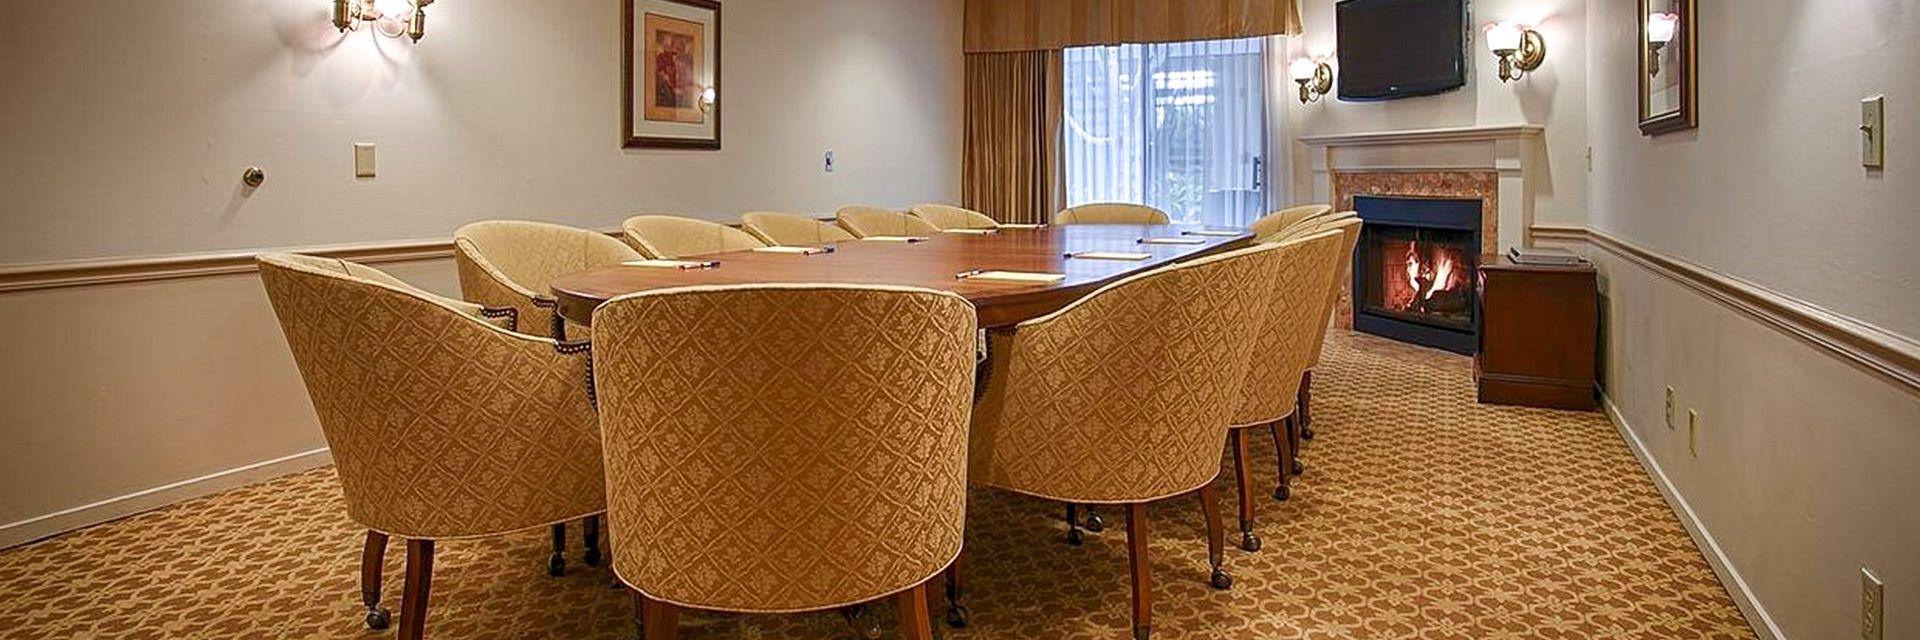 Meeting Room at Hotel Victorian Inn Monterey